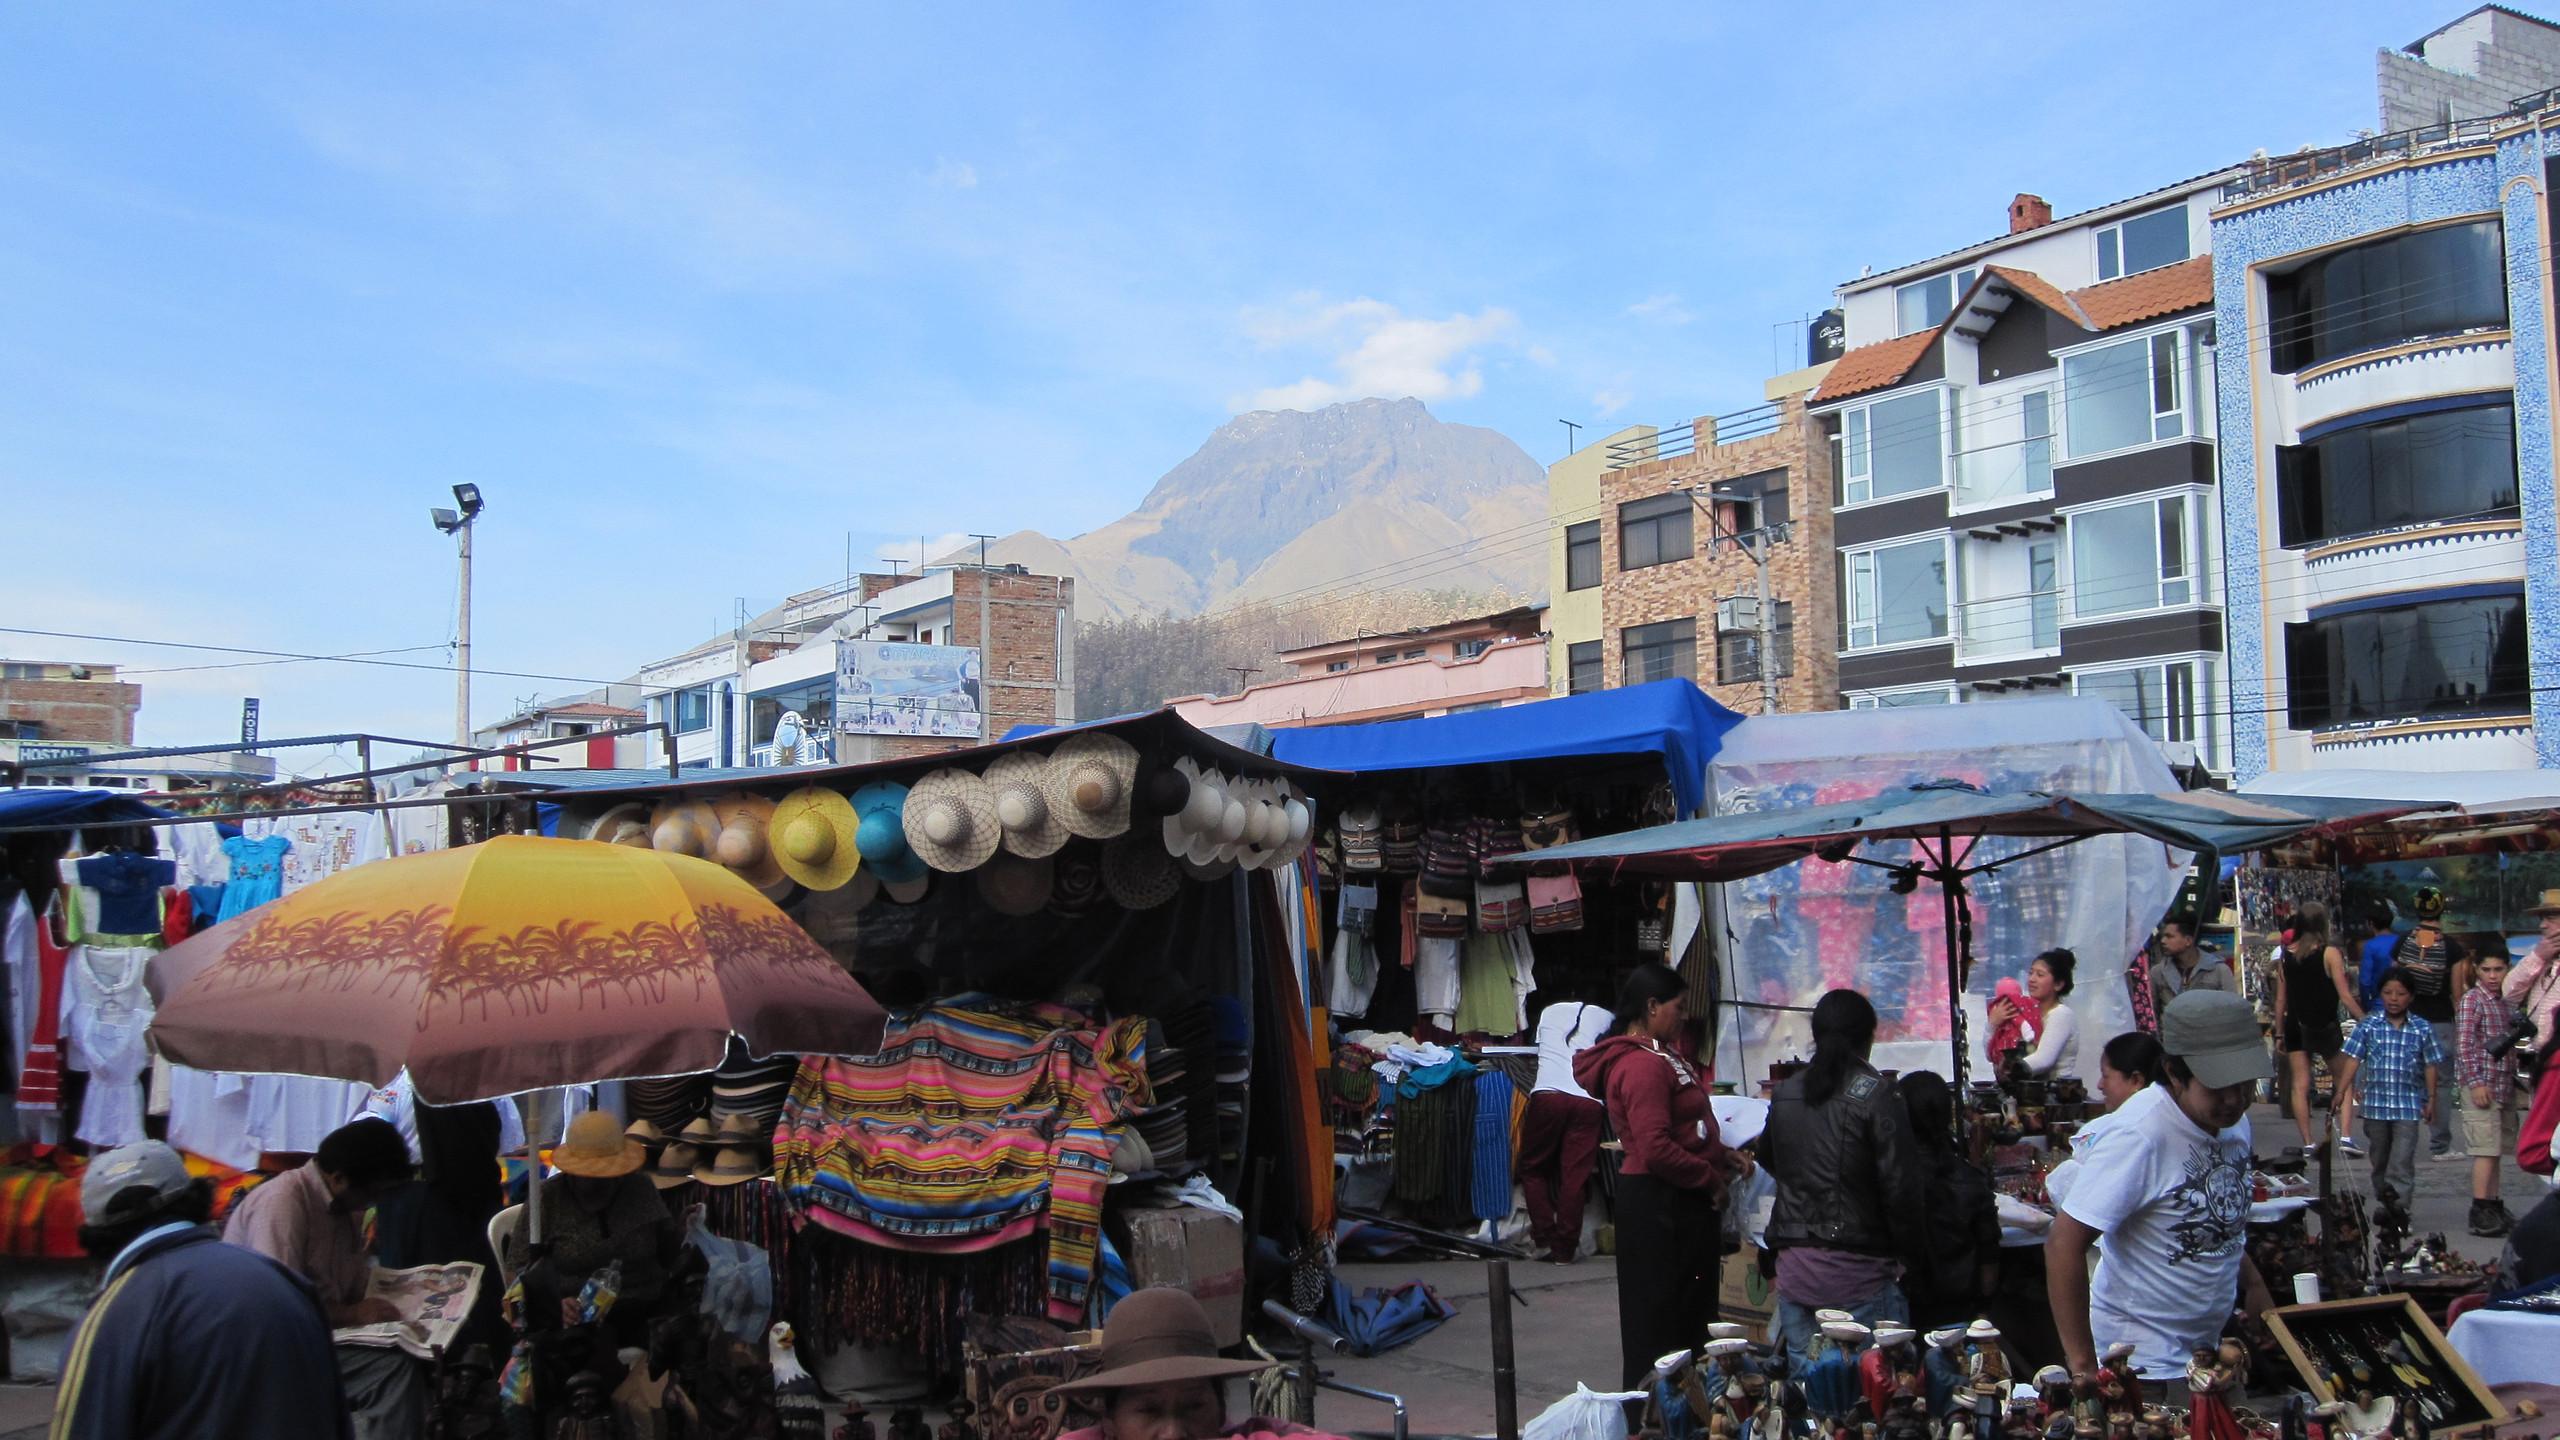 Otavalo's famous Saturday market